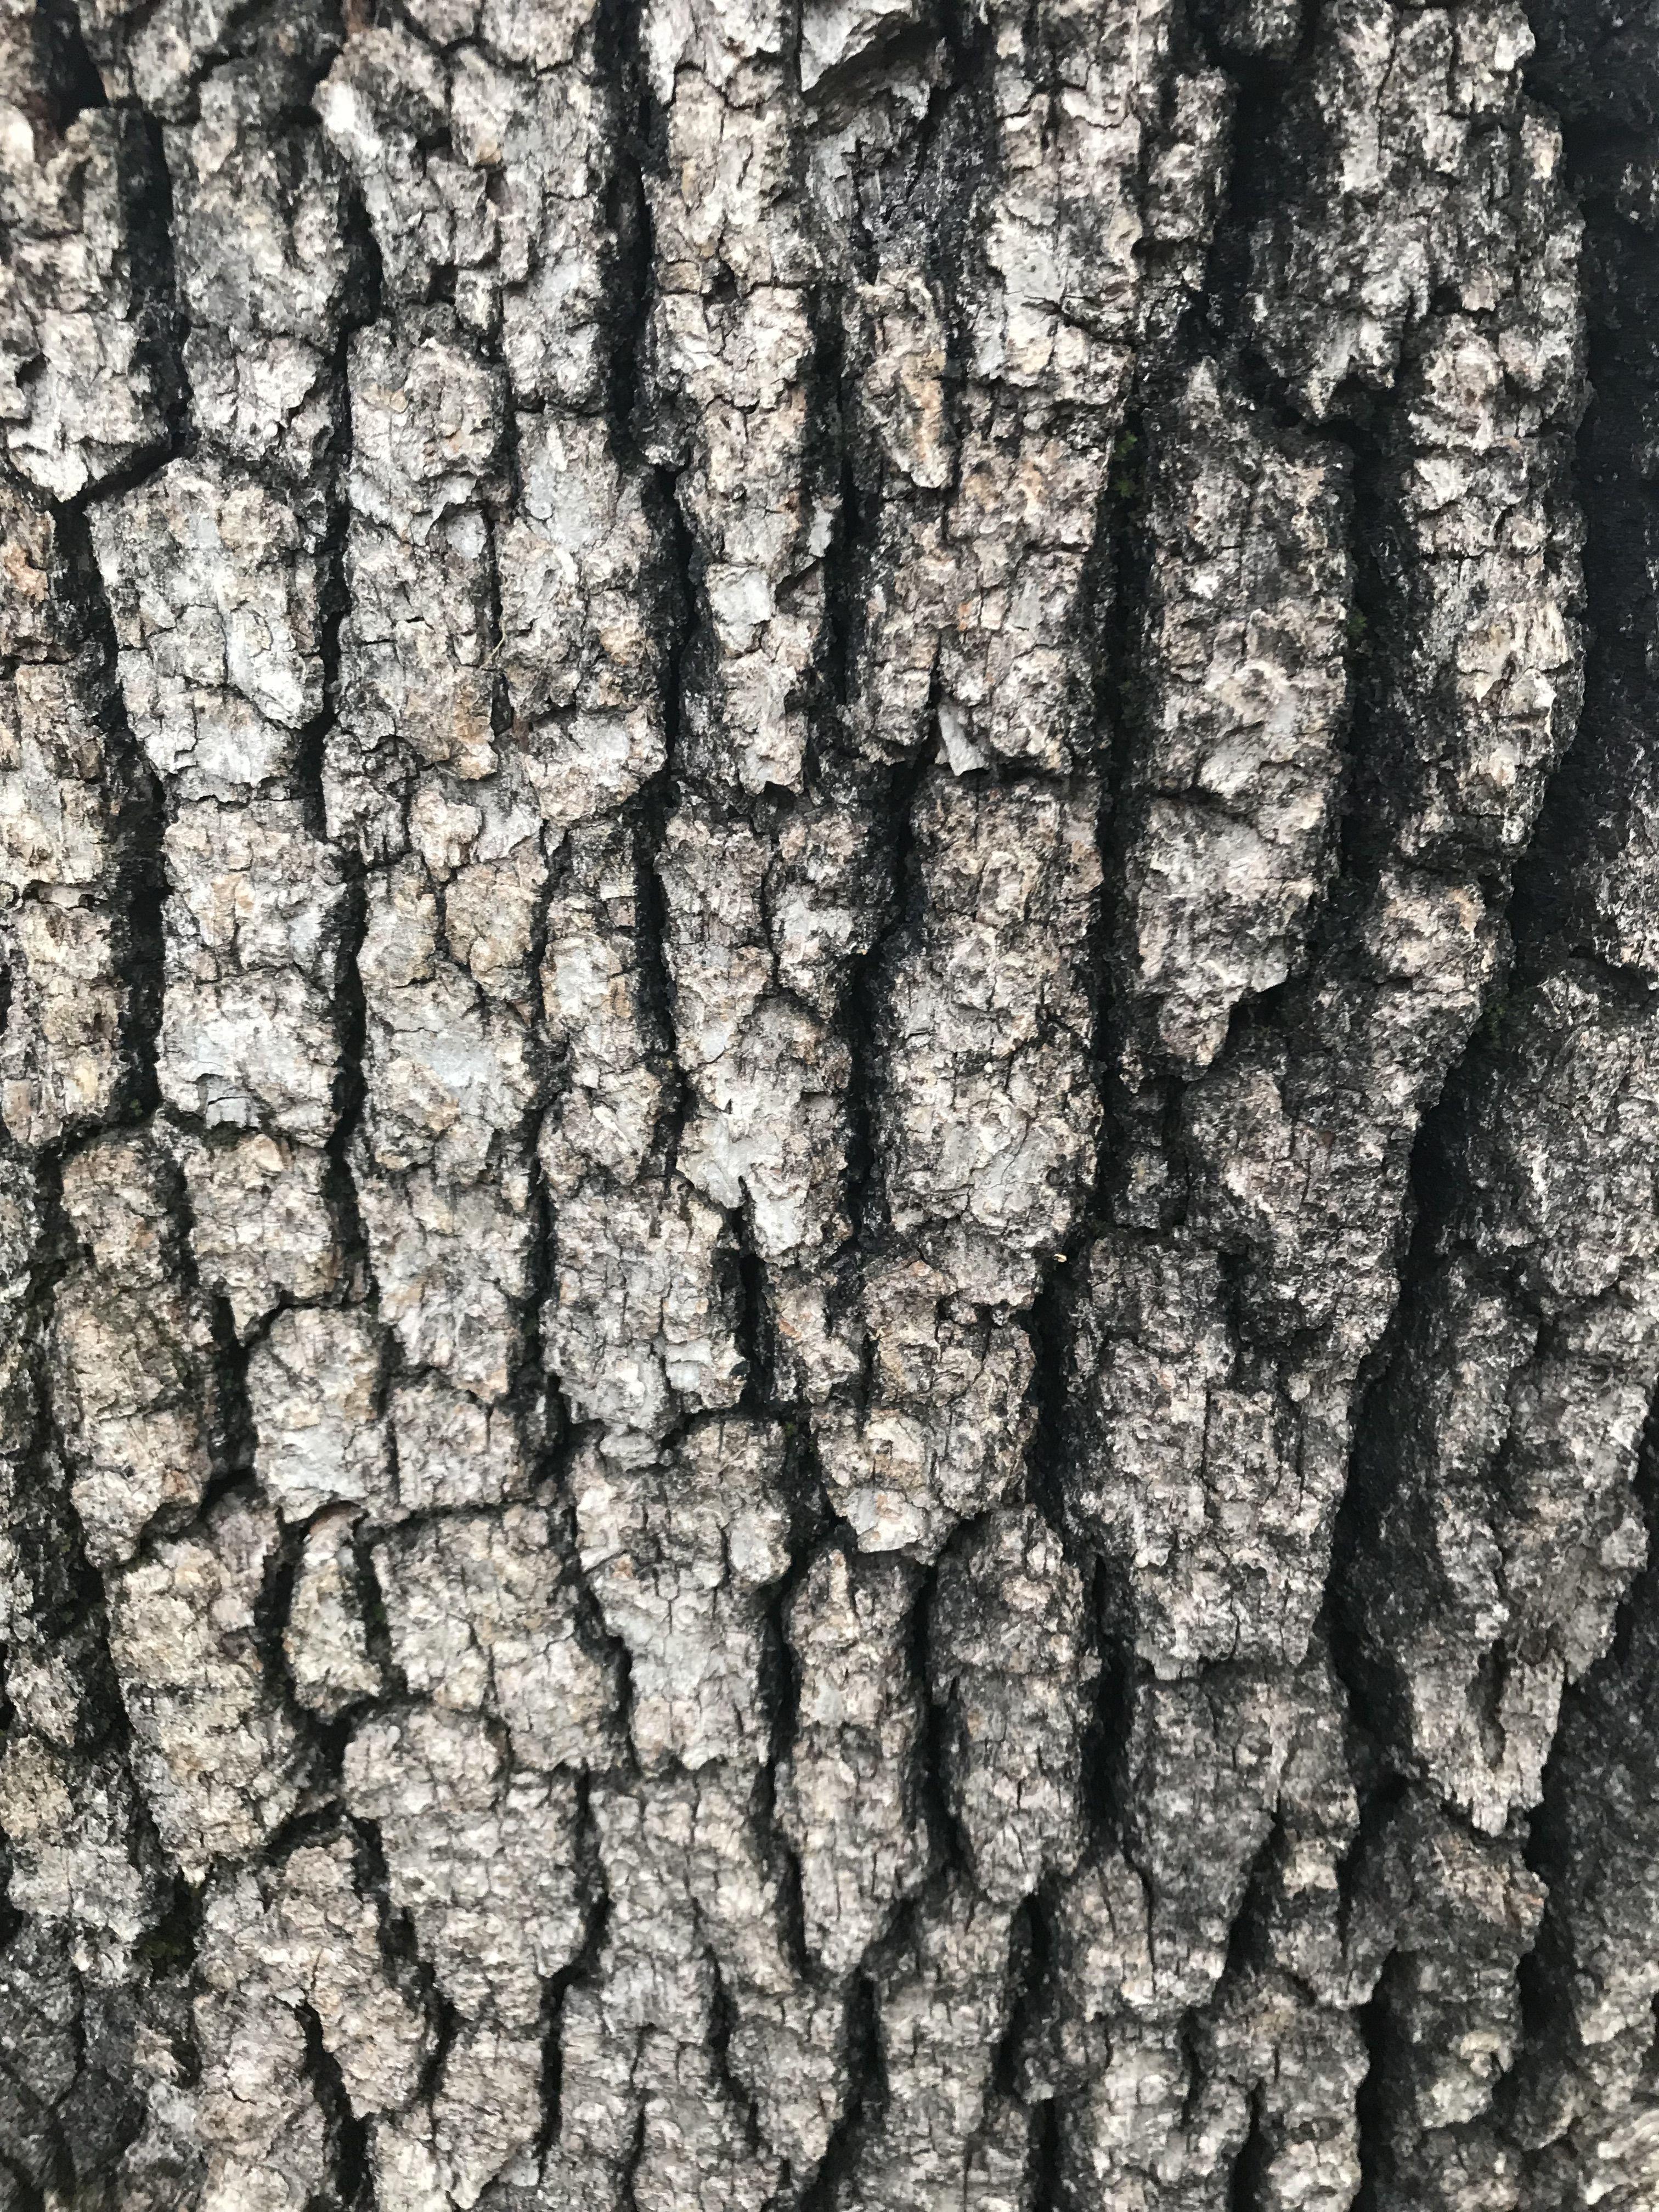 Tree Bark Texture With Images Tree Bark Texture Tree Textures